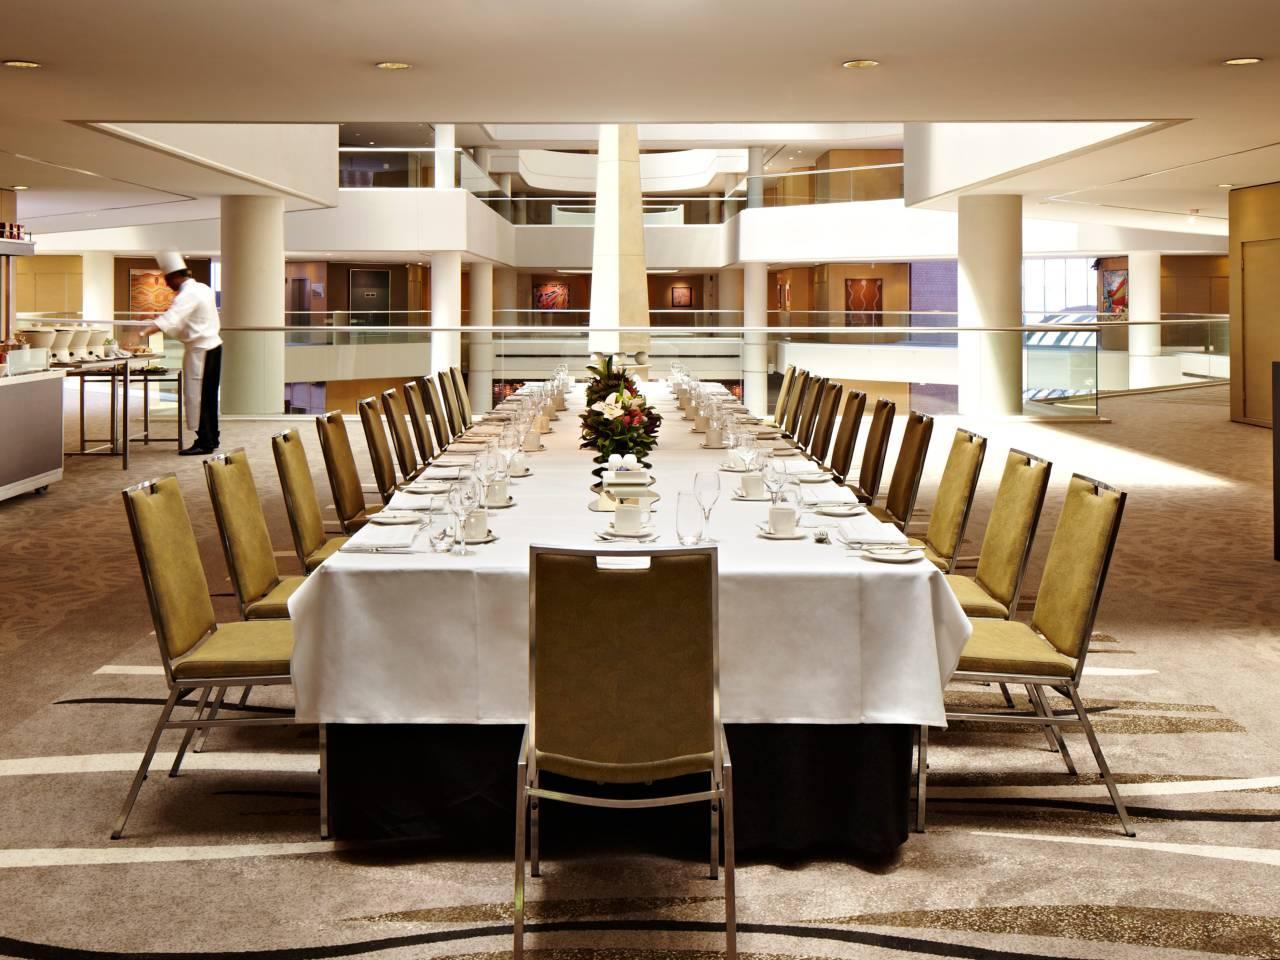 Hotel meeting space